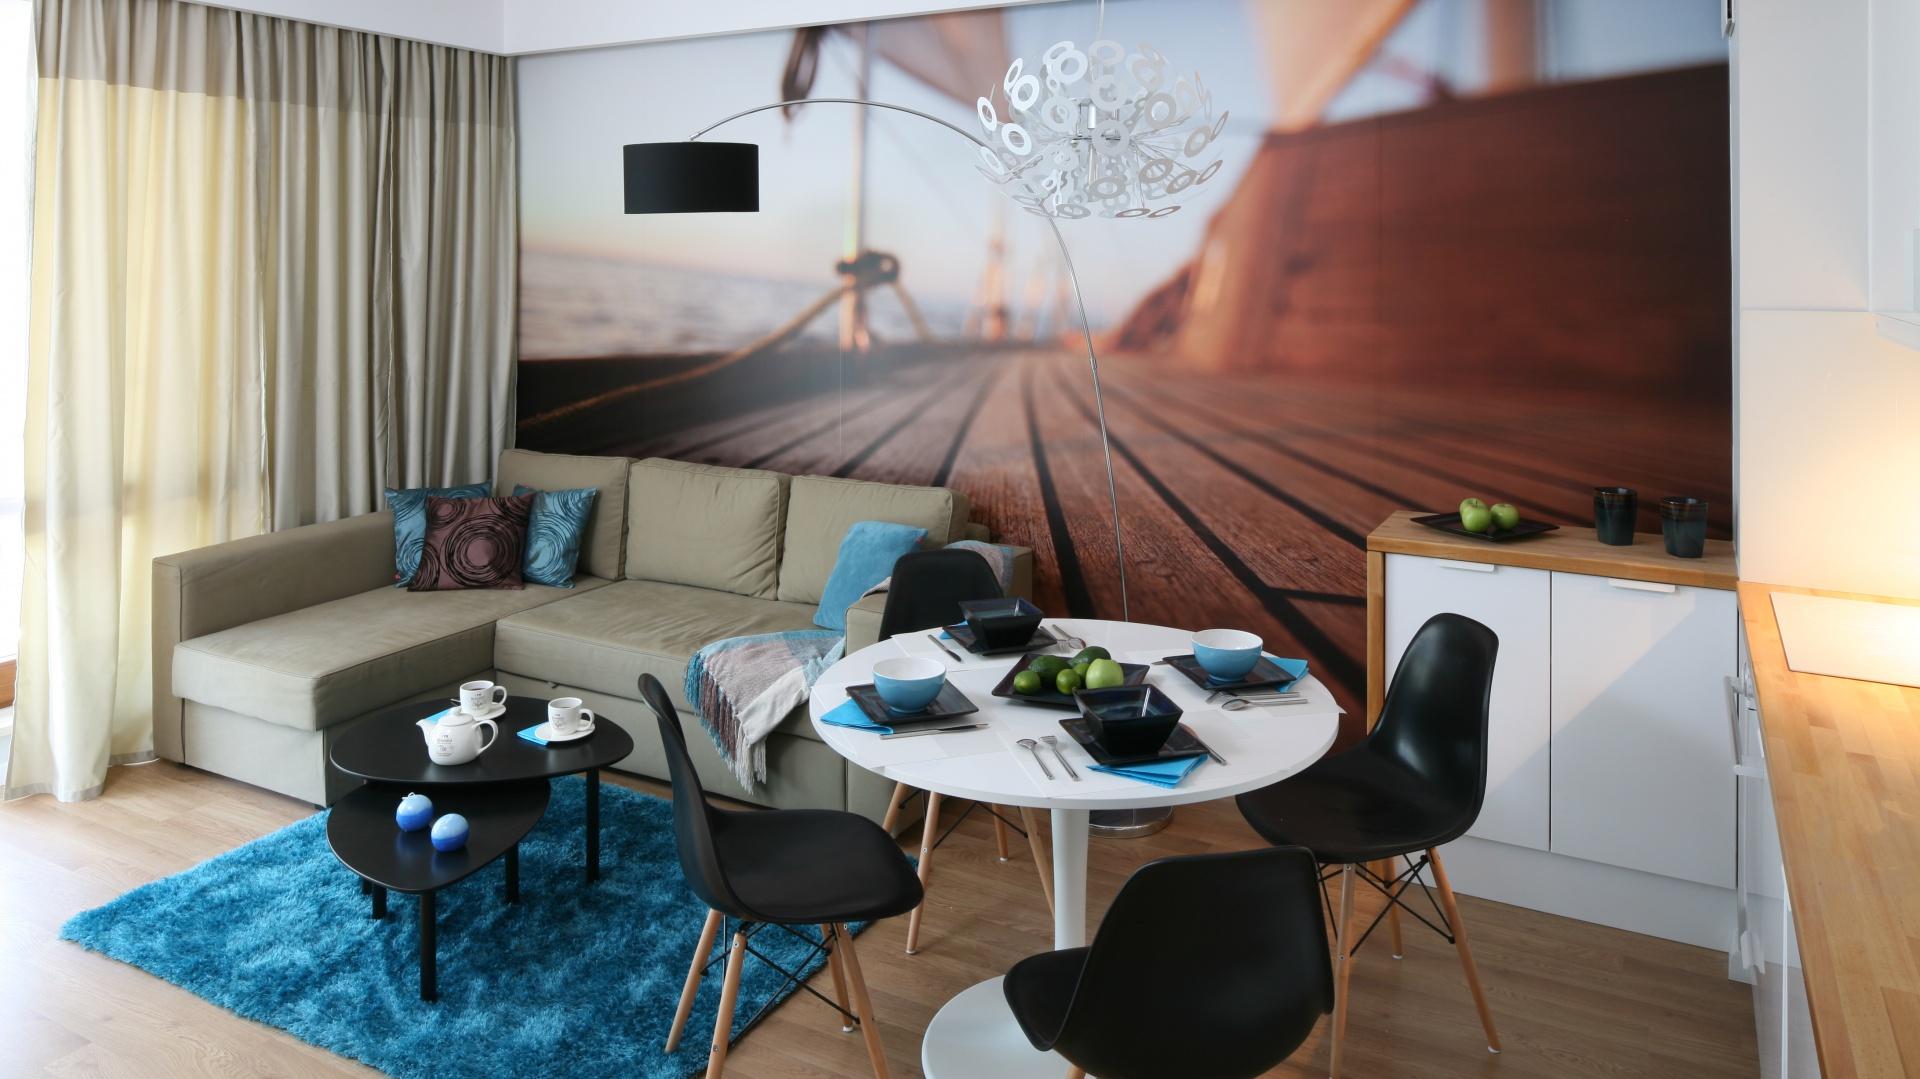 elegant projekt otwart przestrze dzienn mieszkania spaja ogromna fototapeta z efektem gbi. Black Bedroom Furniture Sets. Home Design Ideas